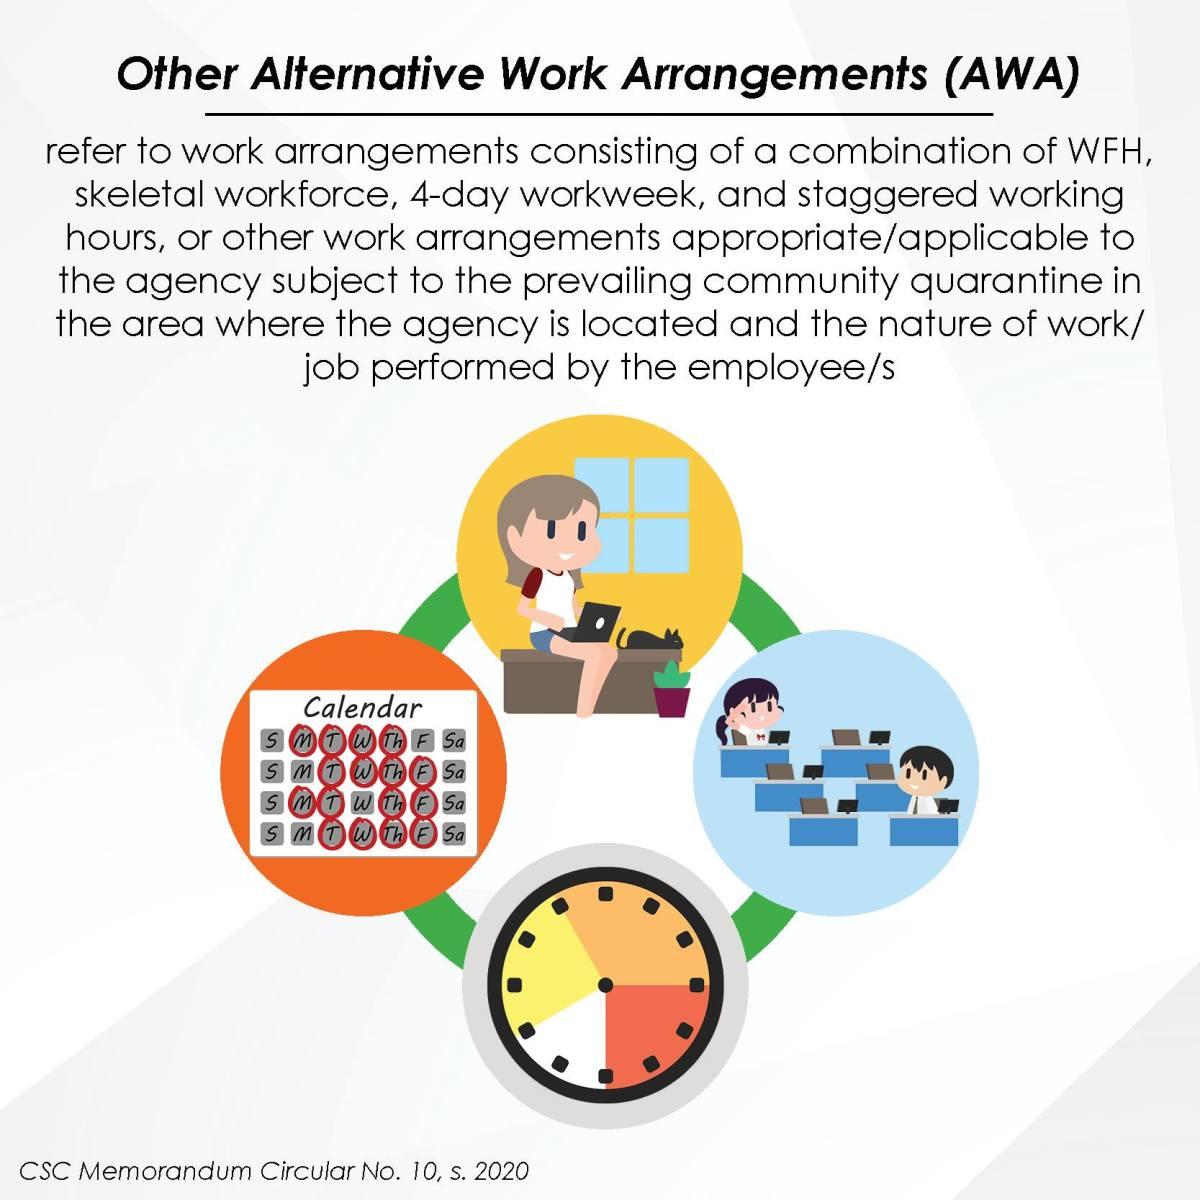 Other Alternative Work Arrangements